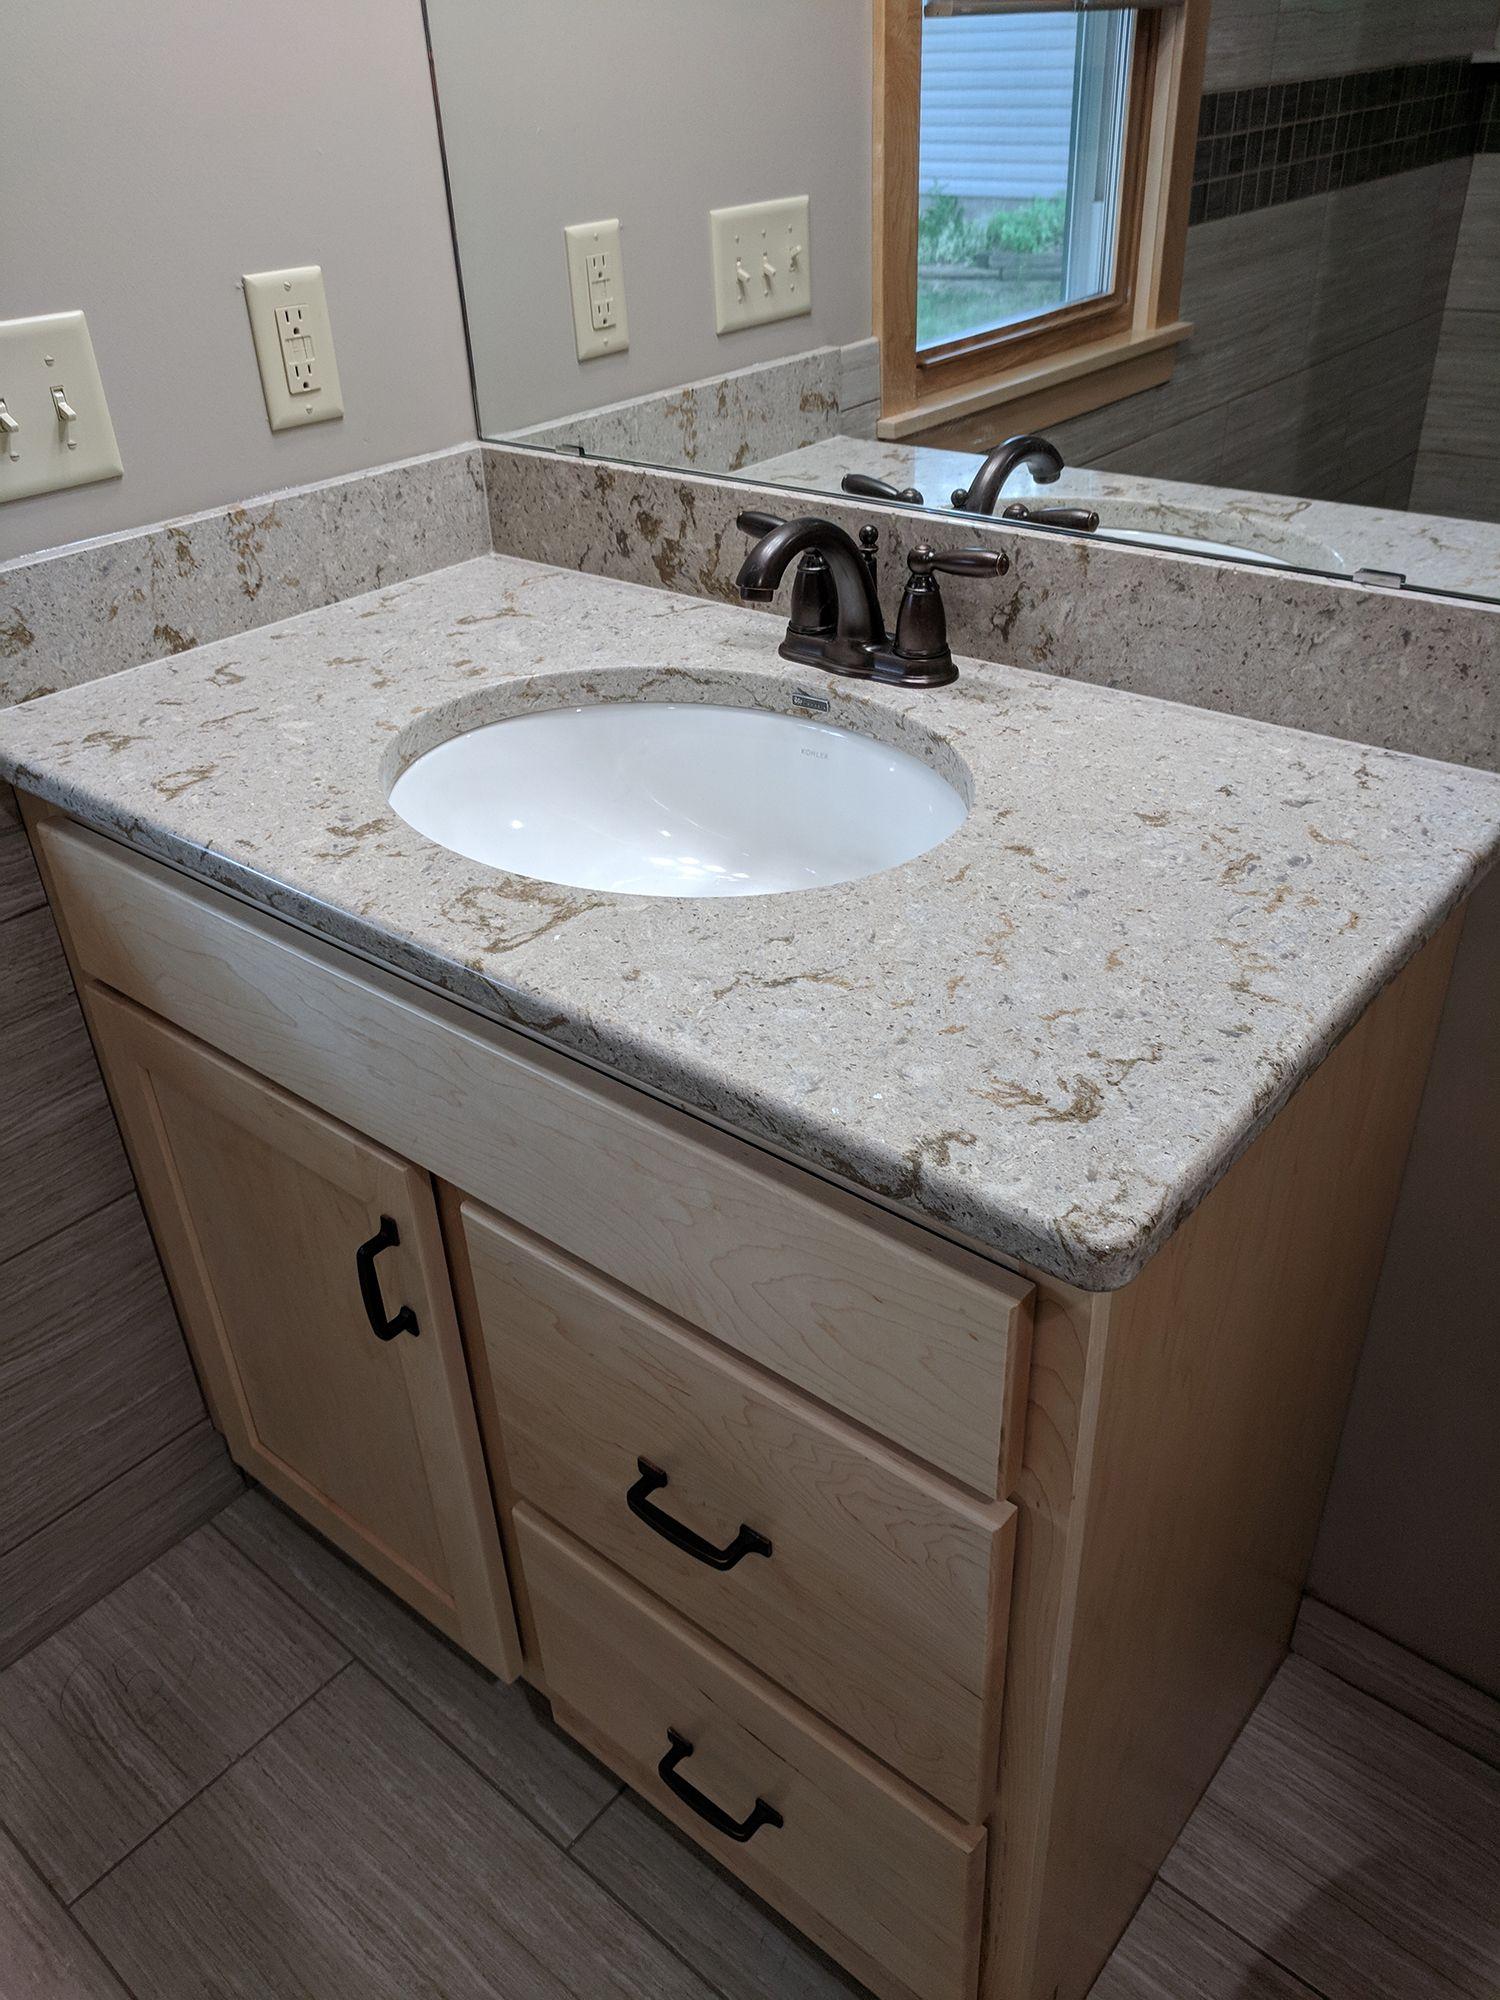 Updated Bathroom Sink Countertop And Cabinet Granite Bathroom